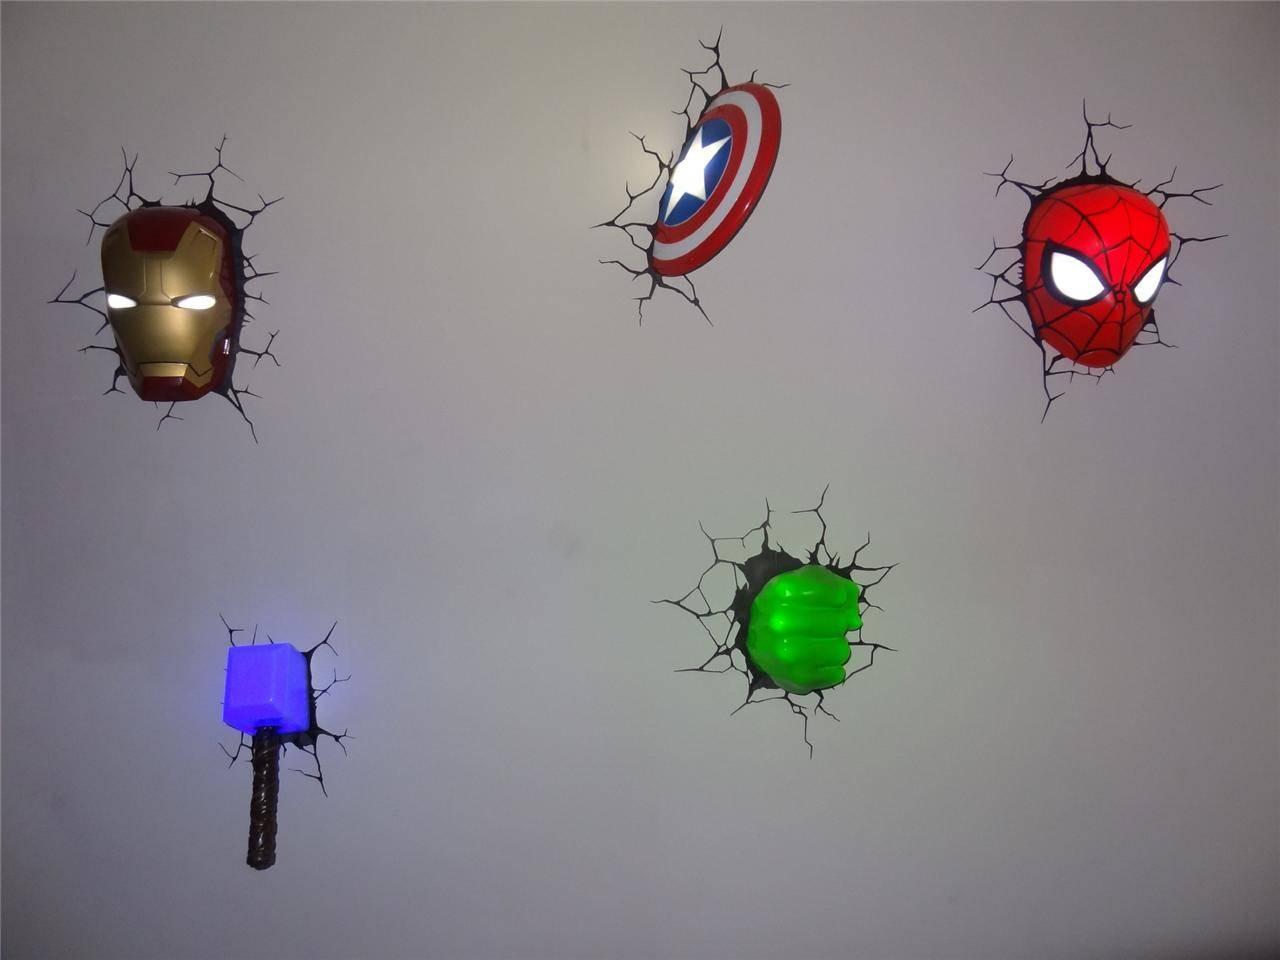 Thor Hammer 3D Wall Art Decor Night Light Lamp Uk | Wallartideas In Best And Newest 3D Wall Art Thor Hammer Night Light (View 15 of 20)